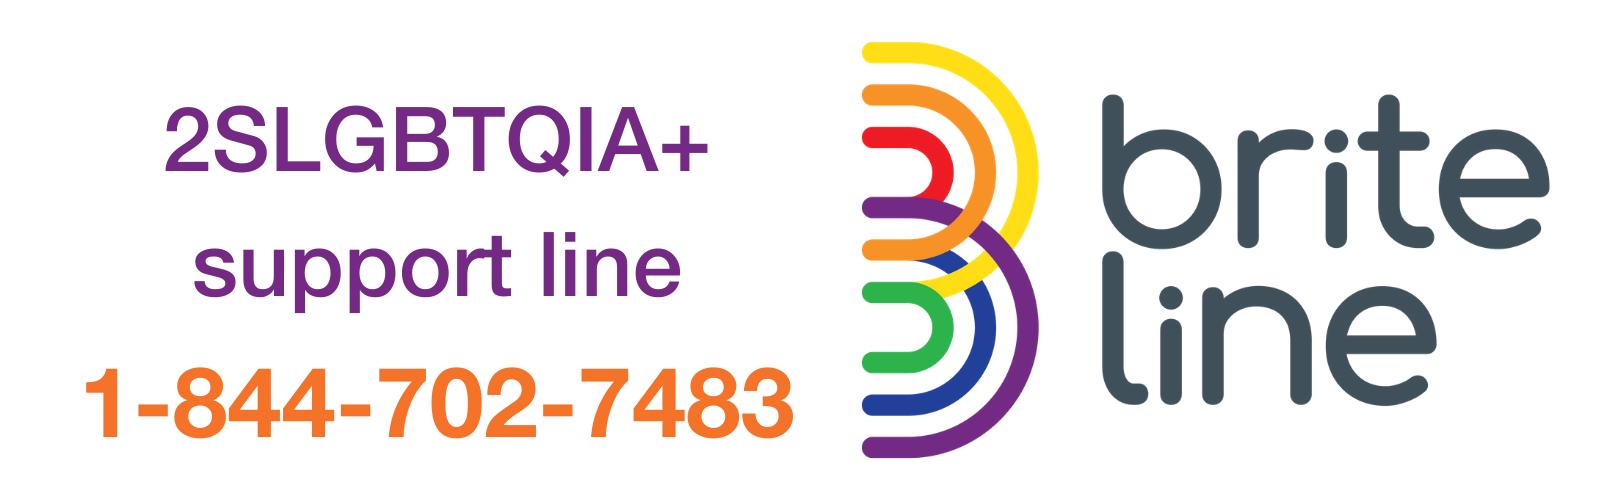 2SLGBTQIA+ support line 1-844-702-7483, Brite Line